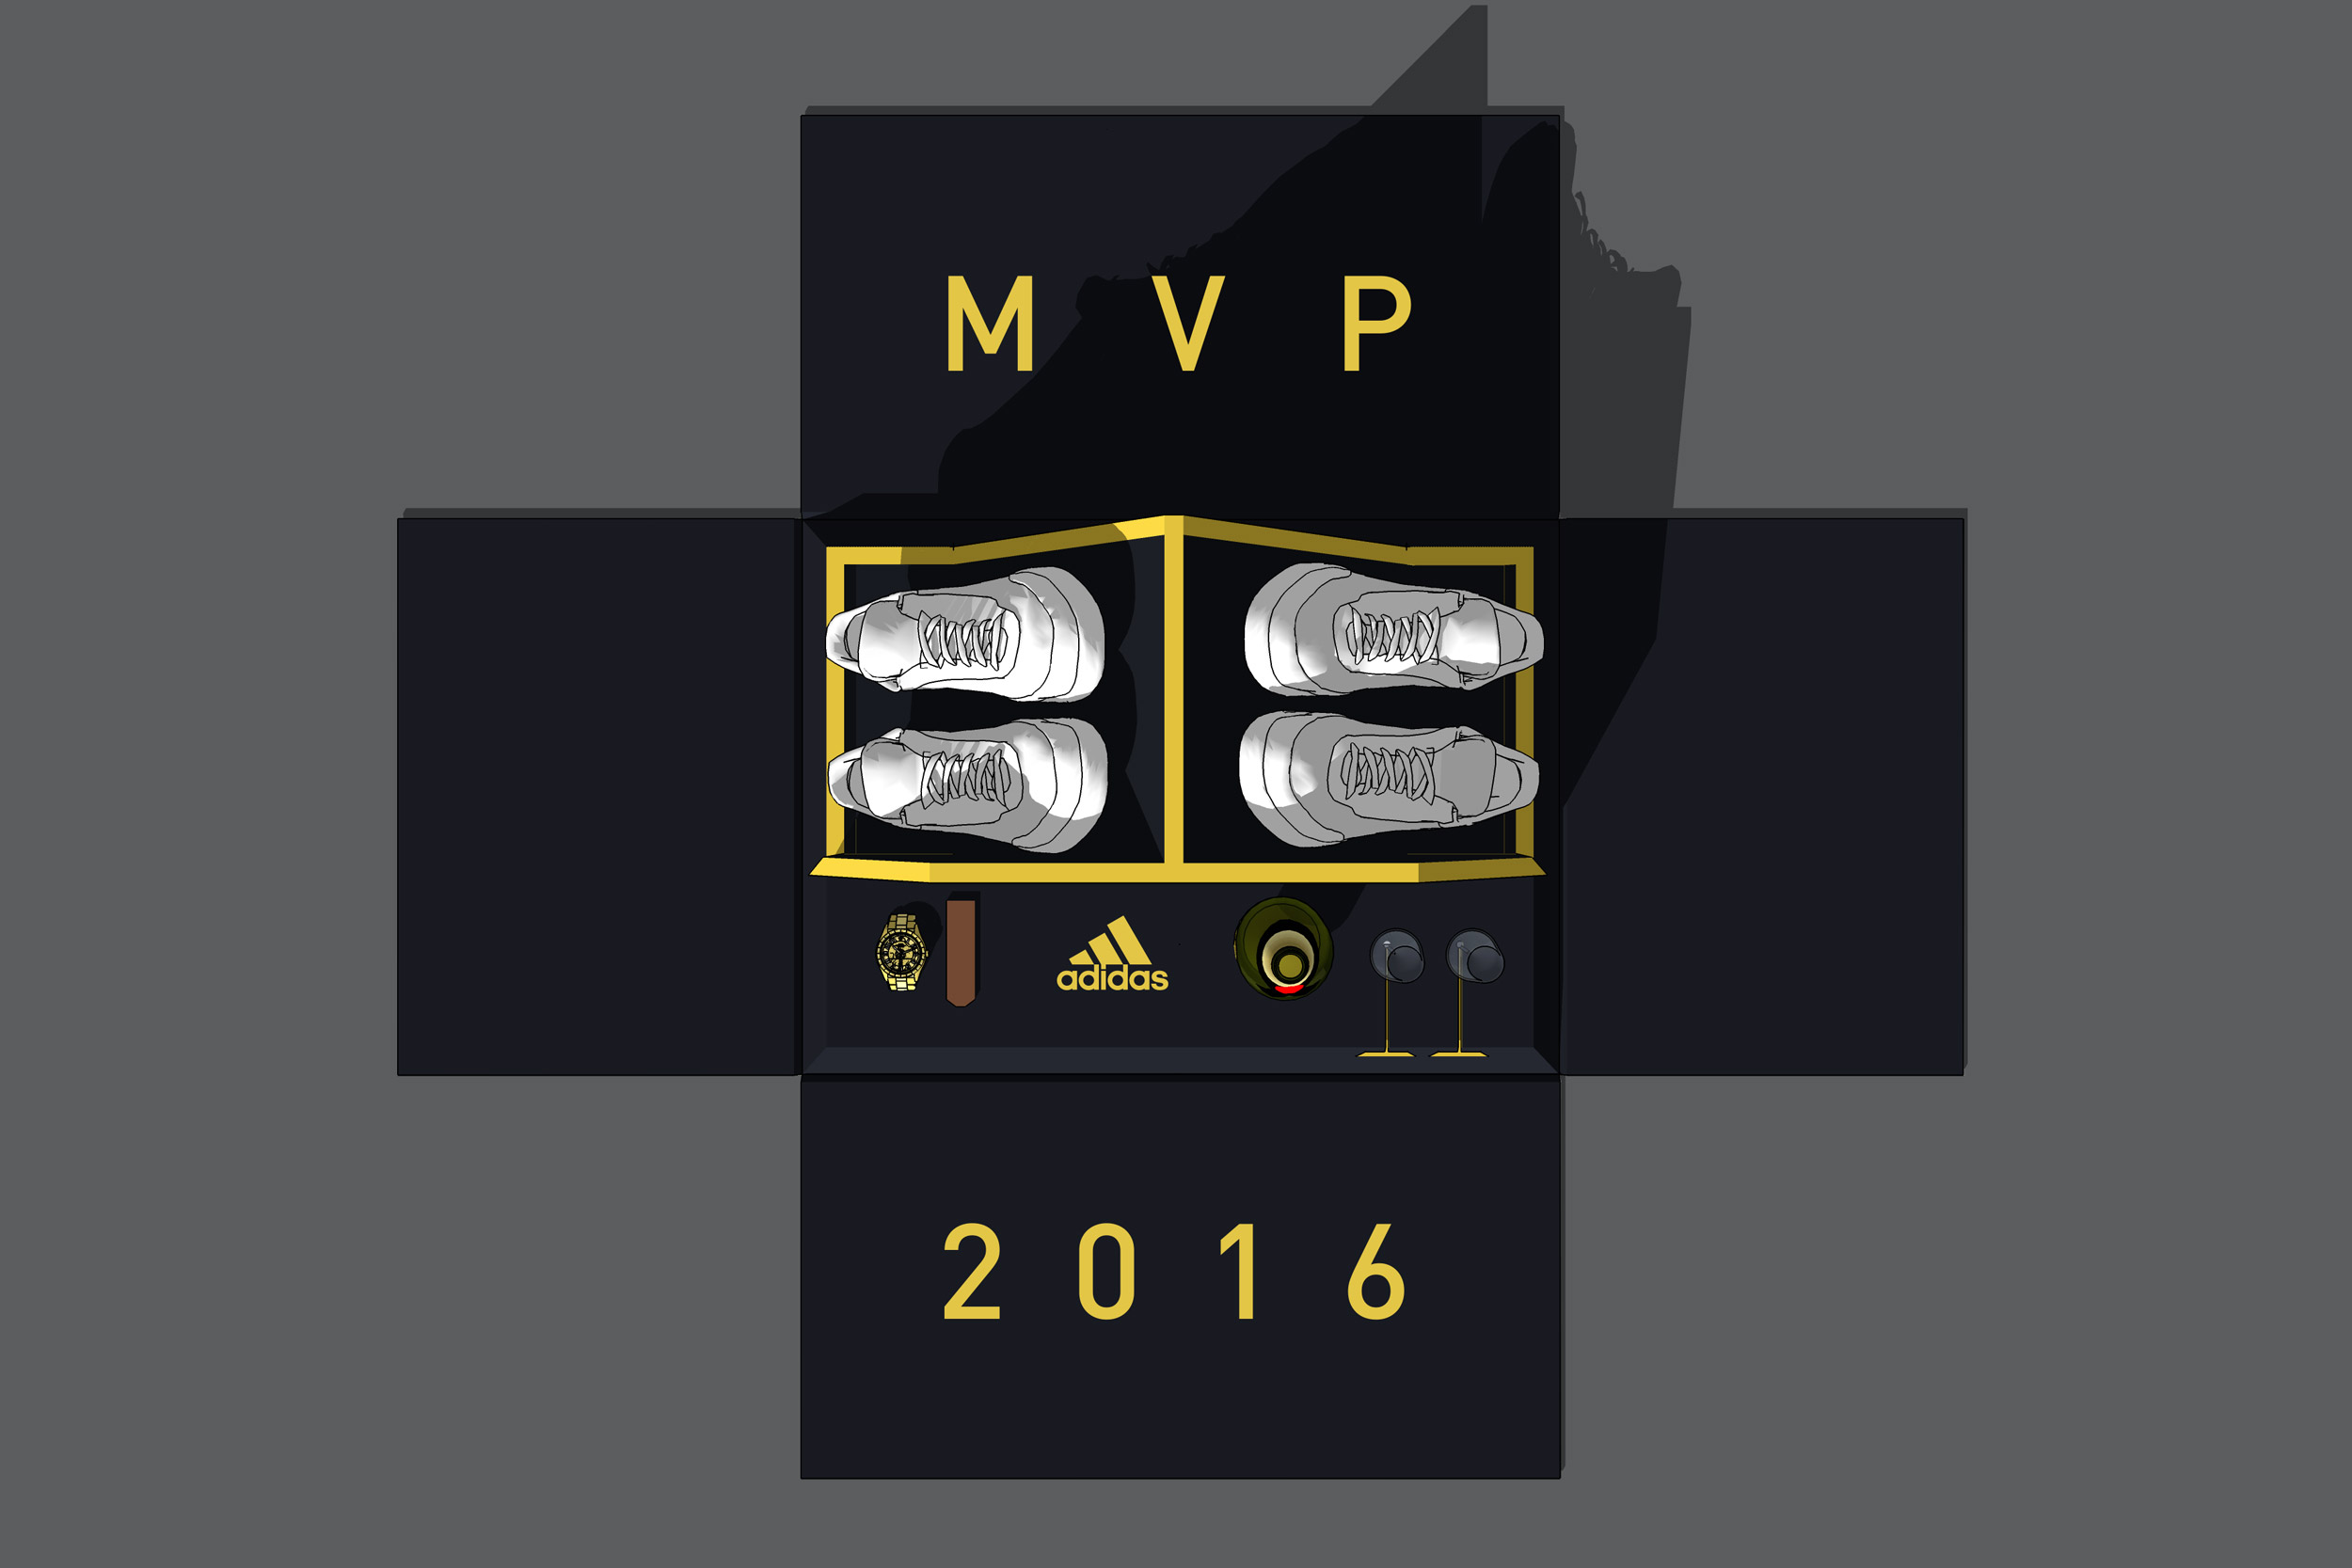 Kris_Bryant_MVP_Box_Bam_RD04_Top.jpg